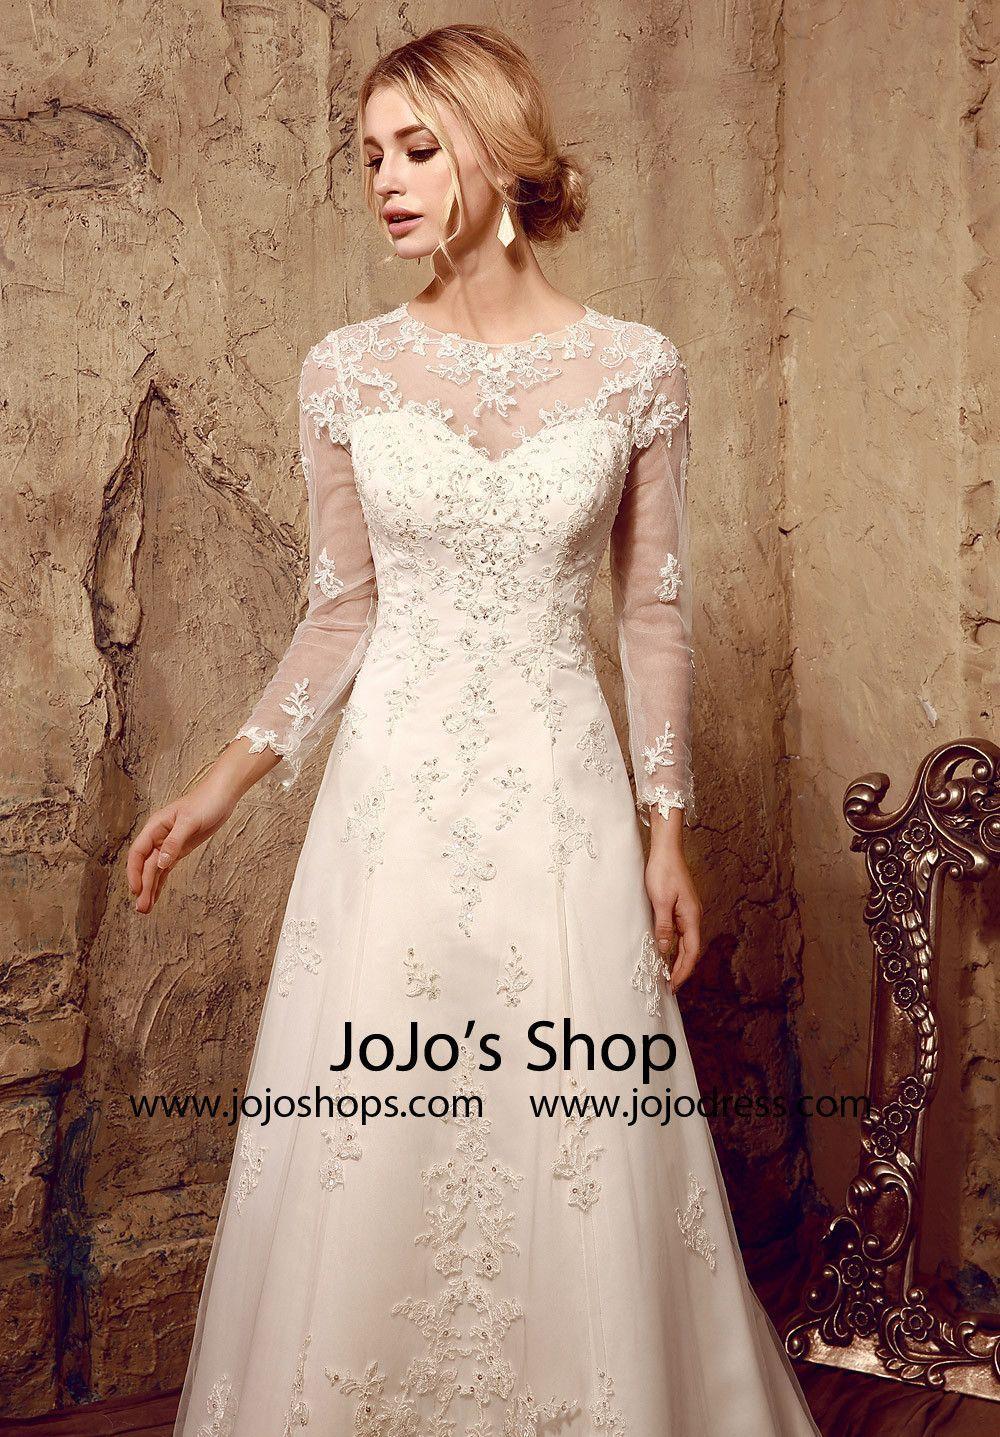 Vintage style lace long sleeves wedding dress with keyhole back